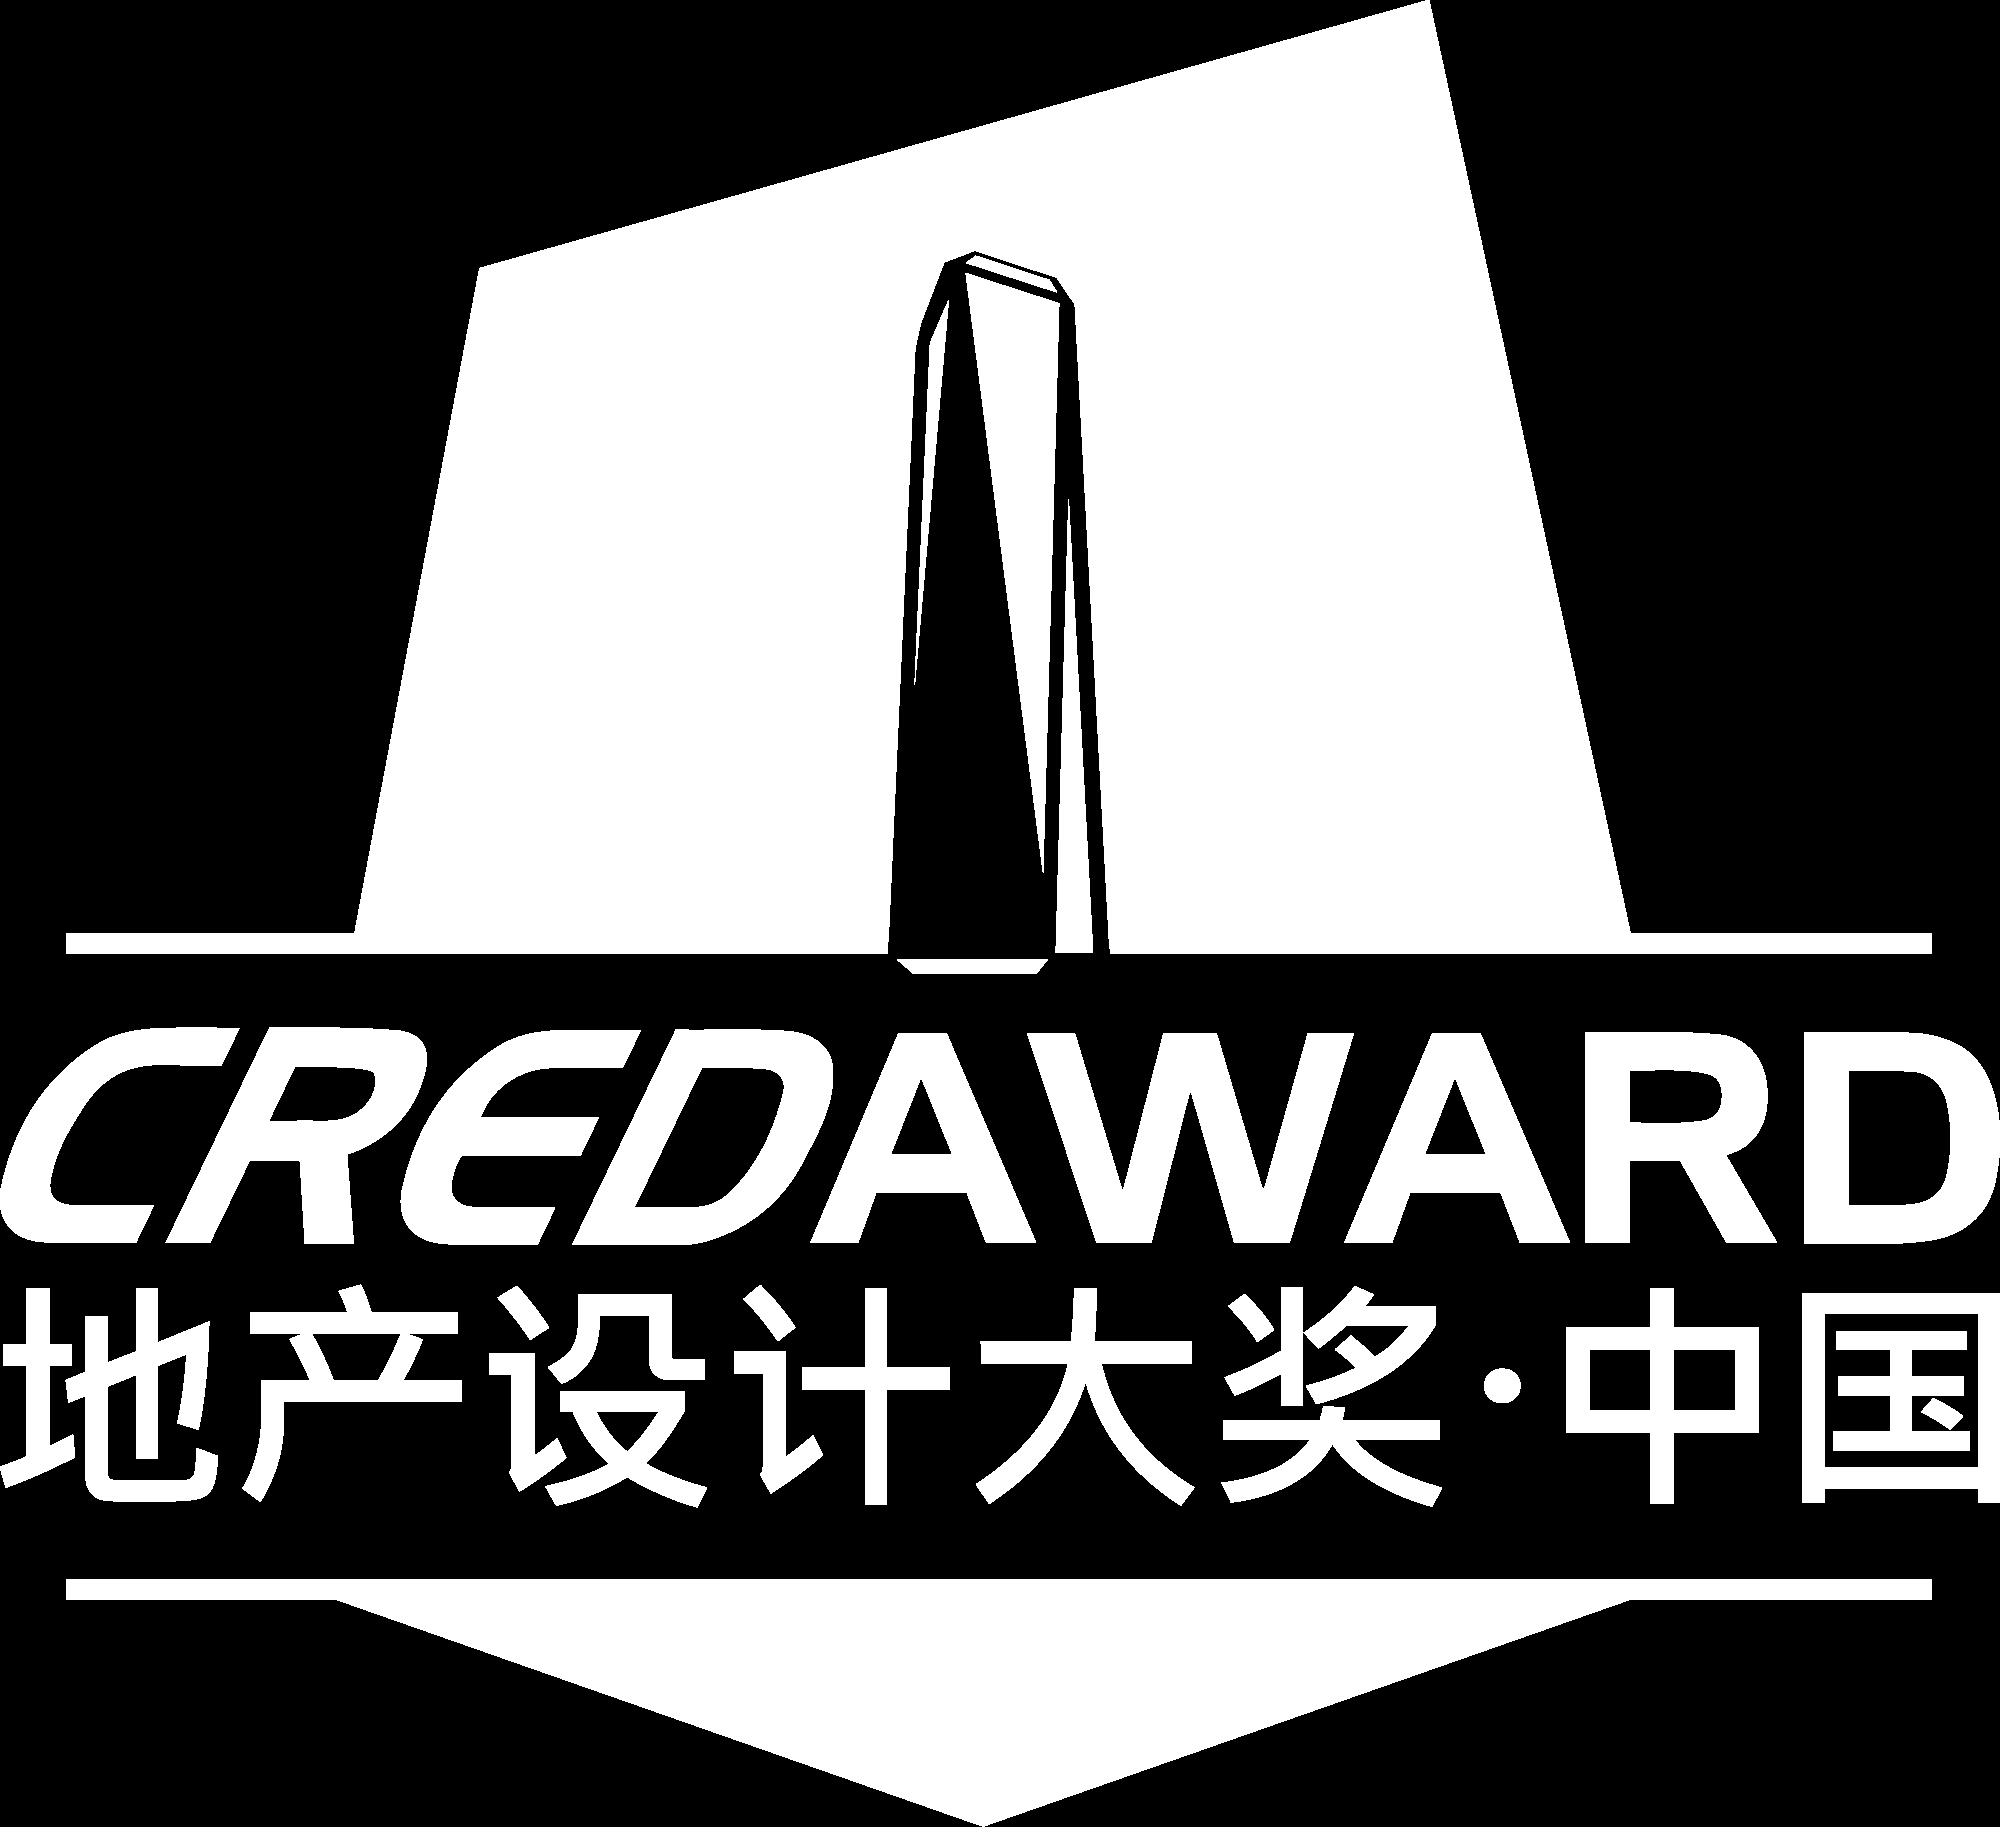 Credaward